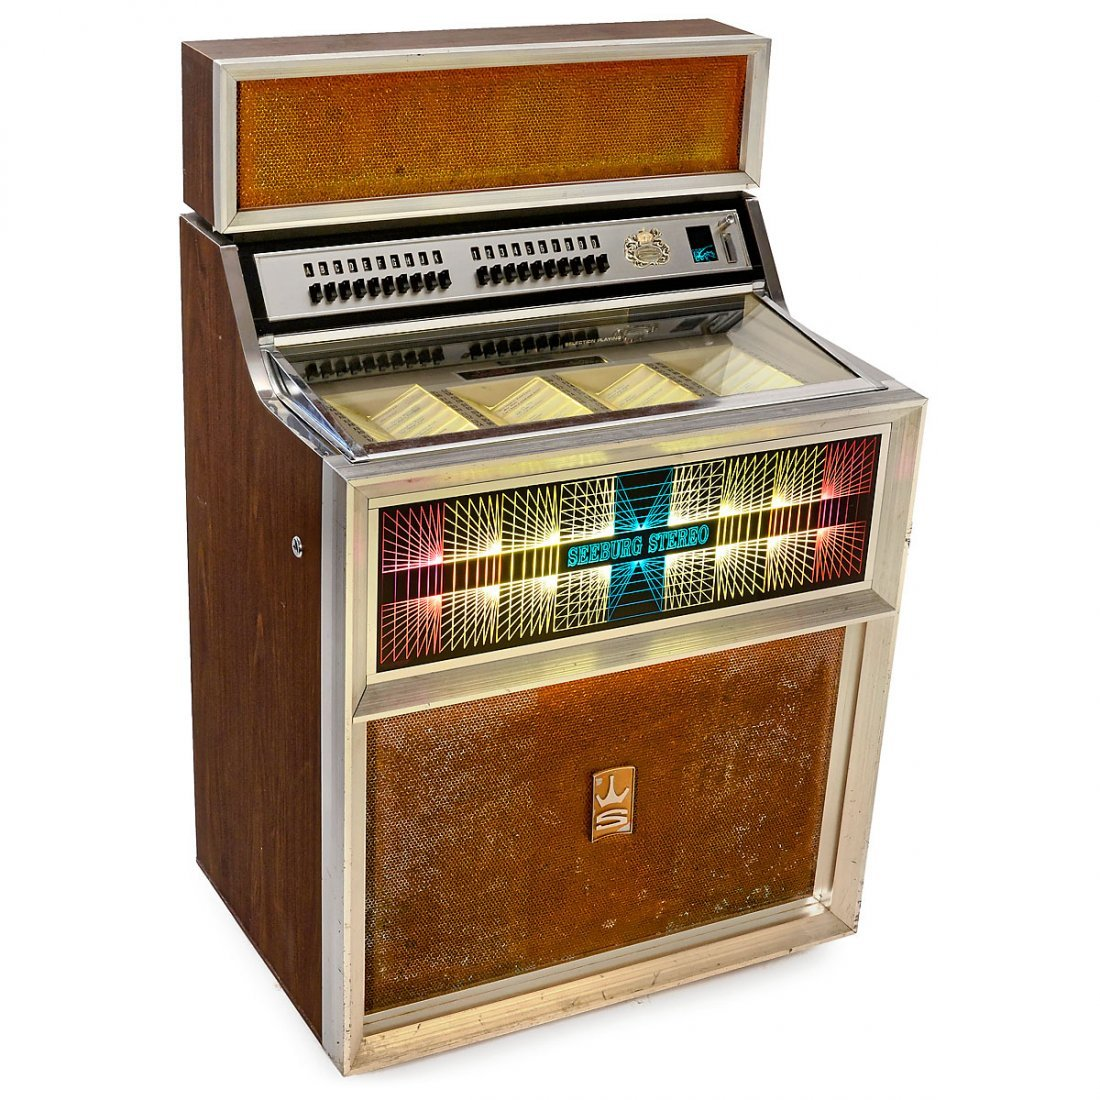 Seeburg Model ESE 100 Jukebox, 1970